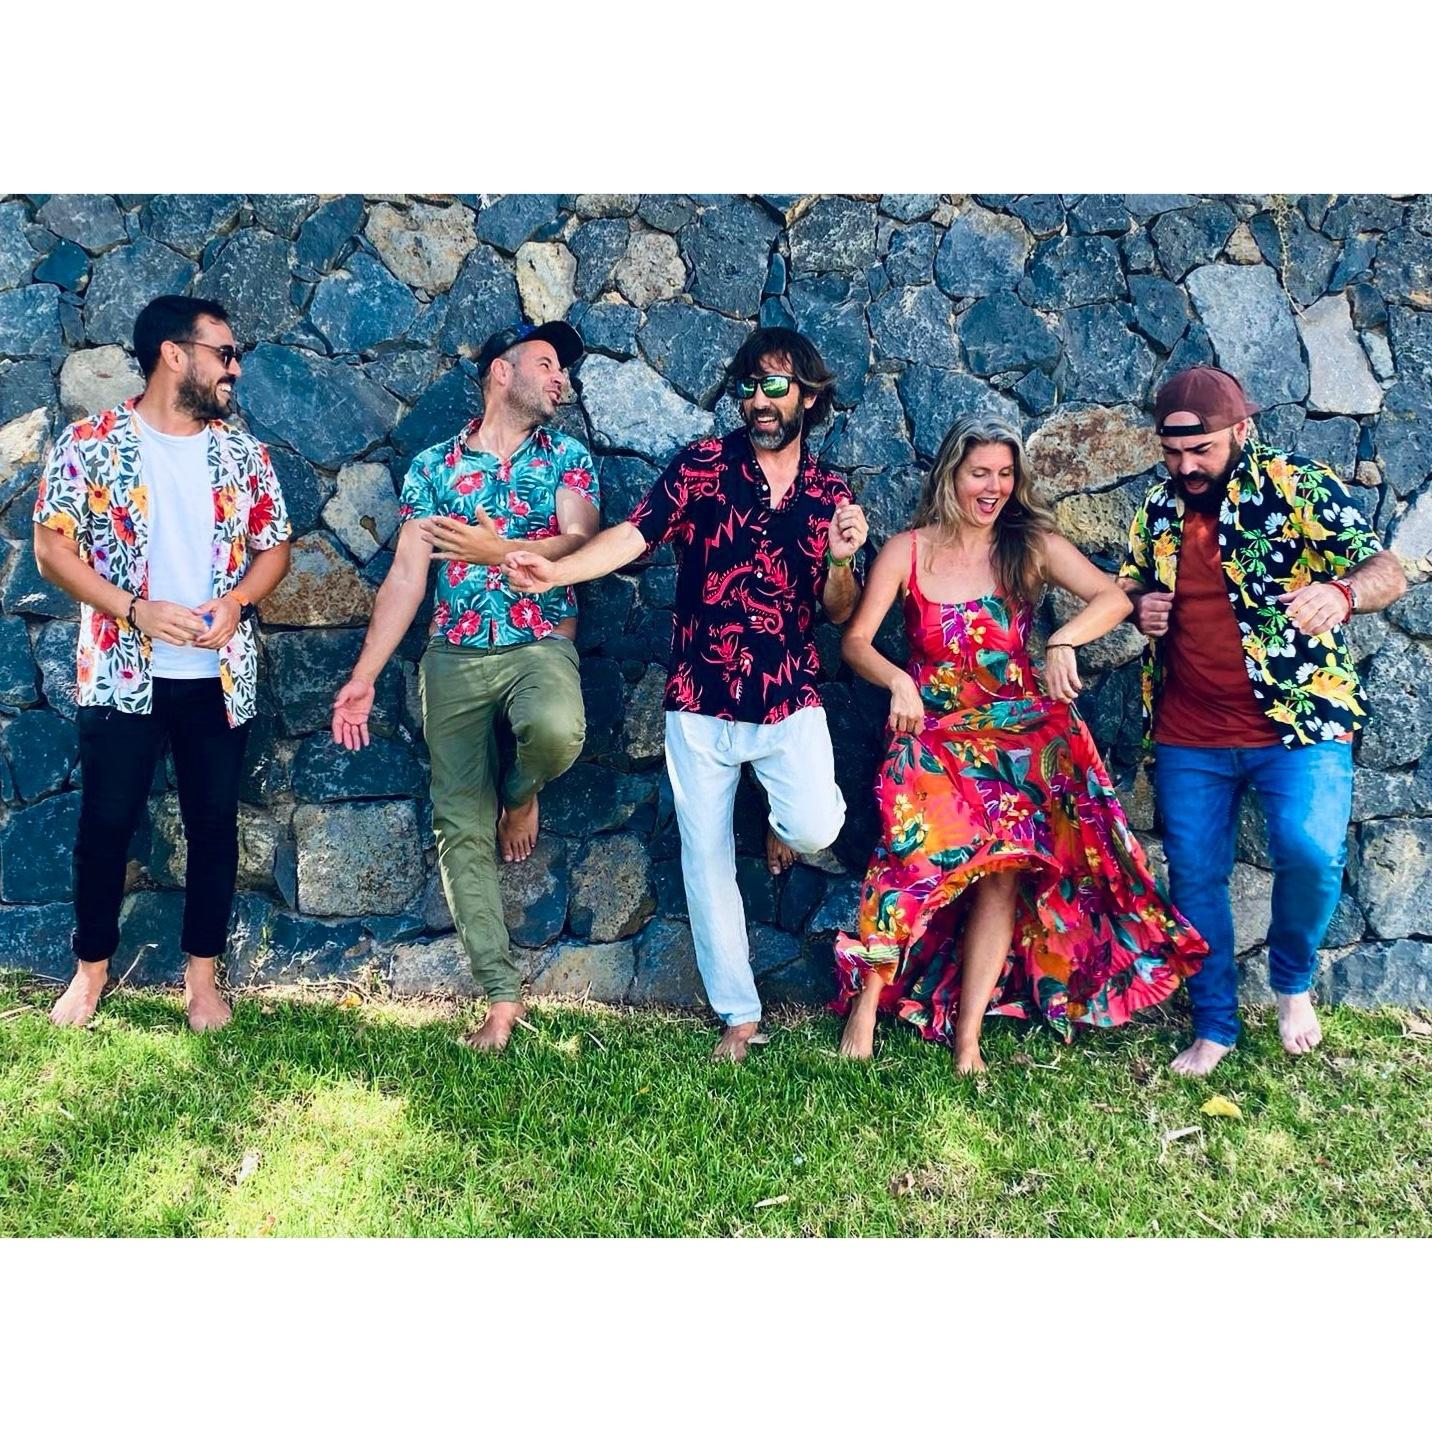 Auditorio de Tenerife offers a concert by Projeto Brasileiro